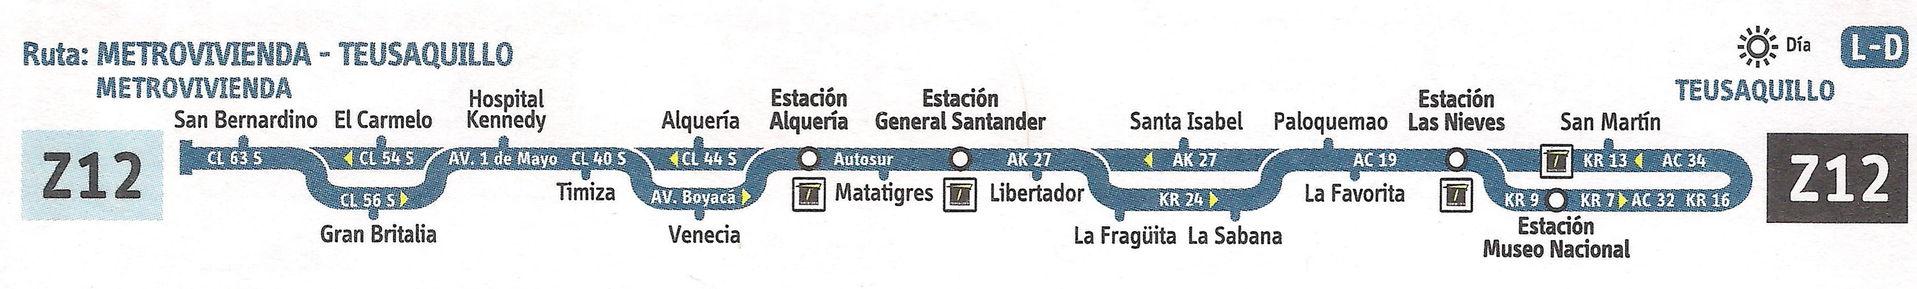 Ruta SITP: Z12 Metrovivienda ↔ Teusaquillo [Urbana] 1